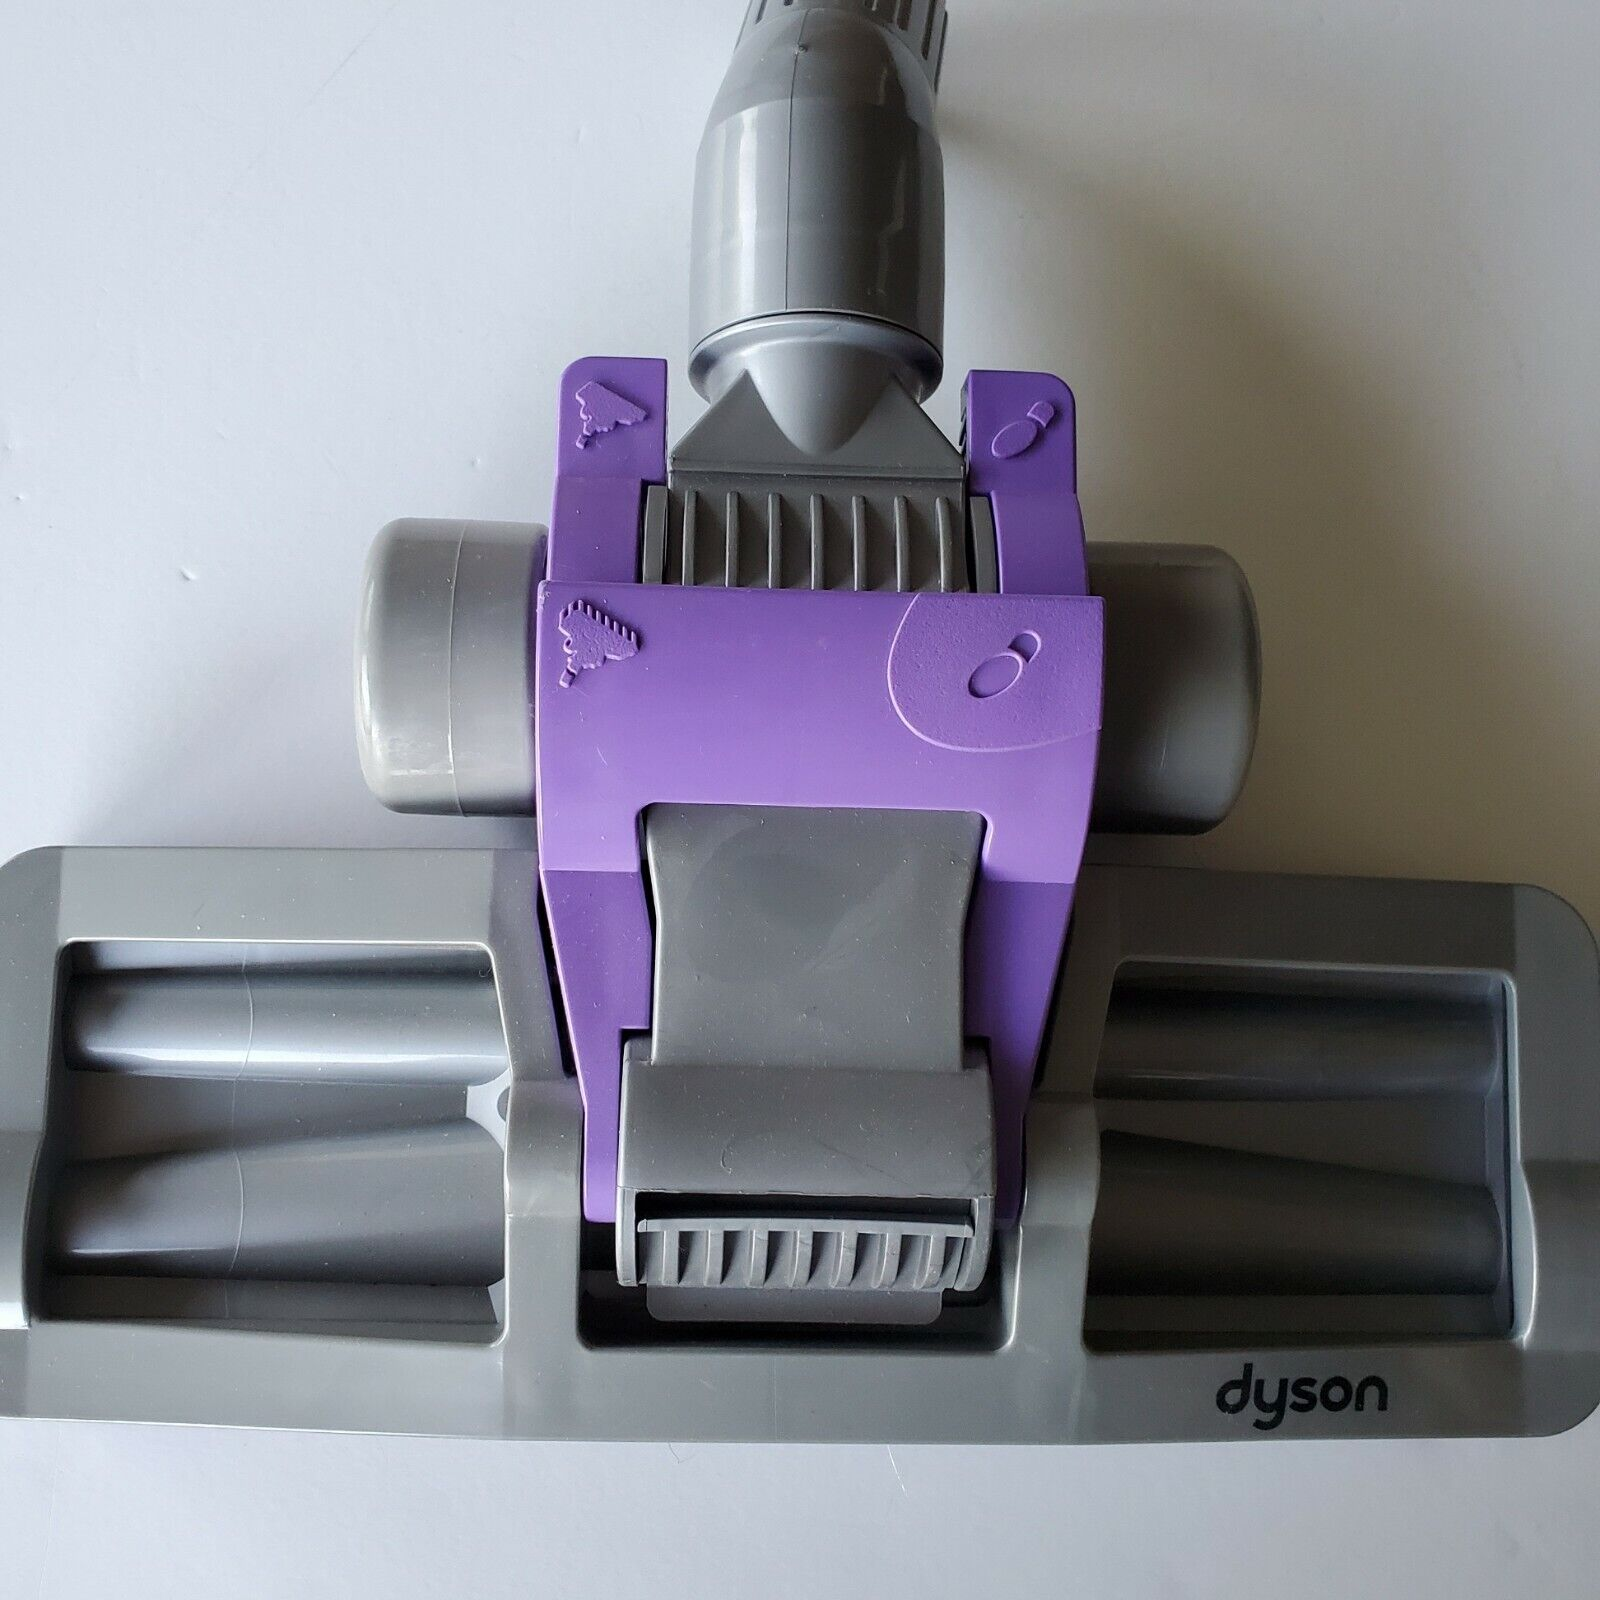 vacuum bare floor hardwood attachment gray purple